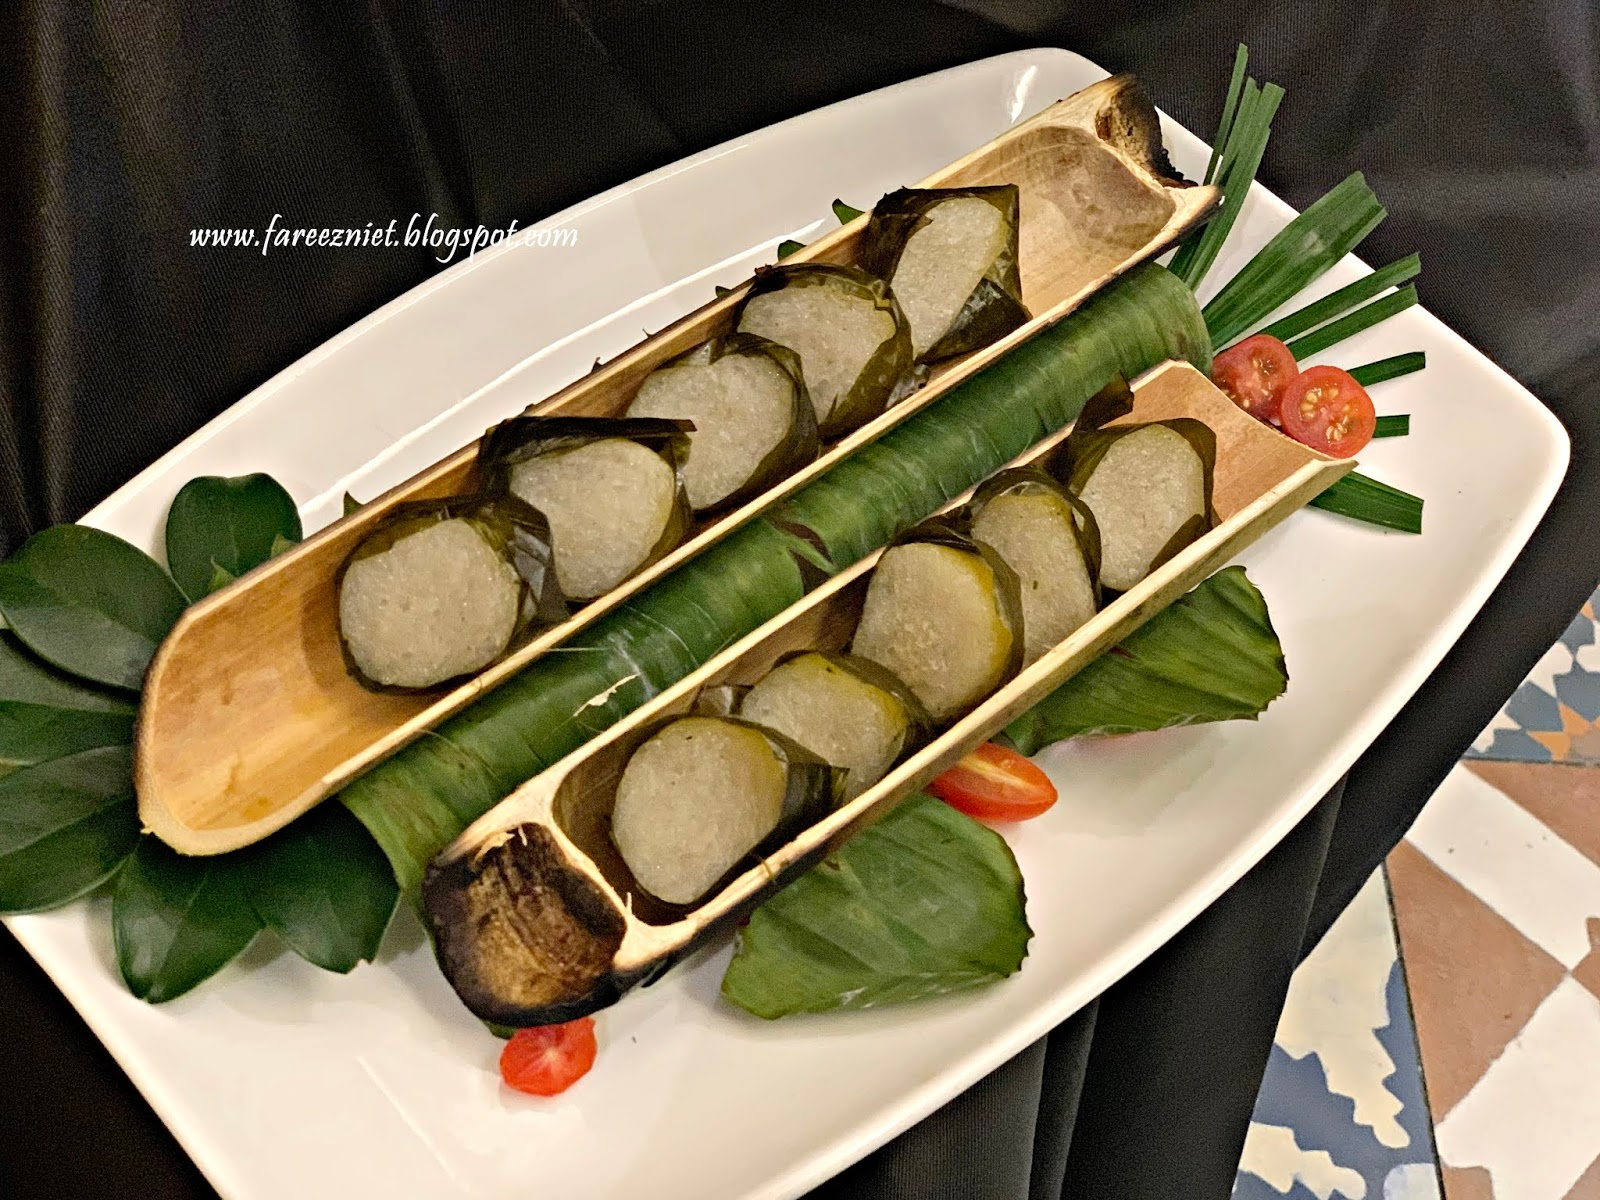 ramadhan buffet 2020 sajian warisan budaya citarasa yang ditawarkan di swiss garden genting